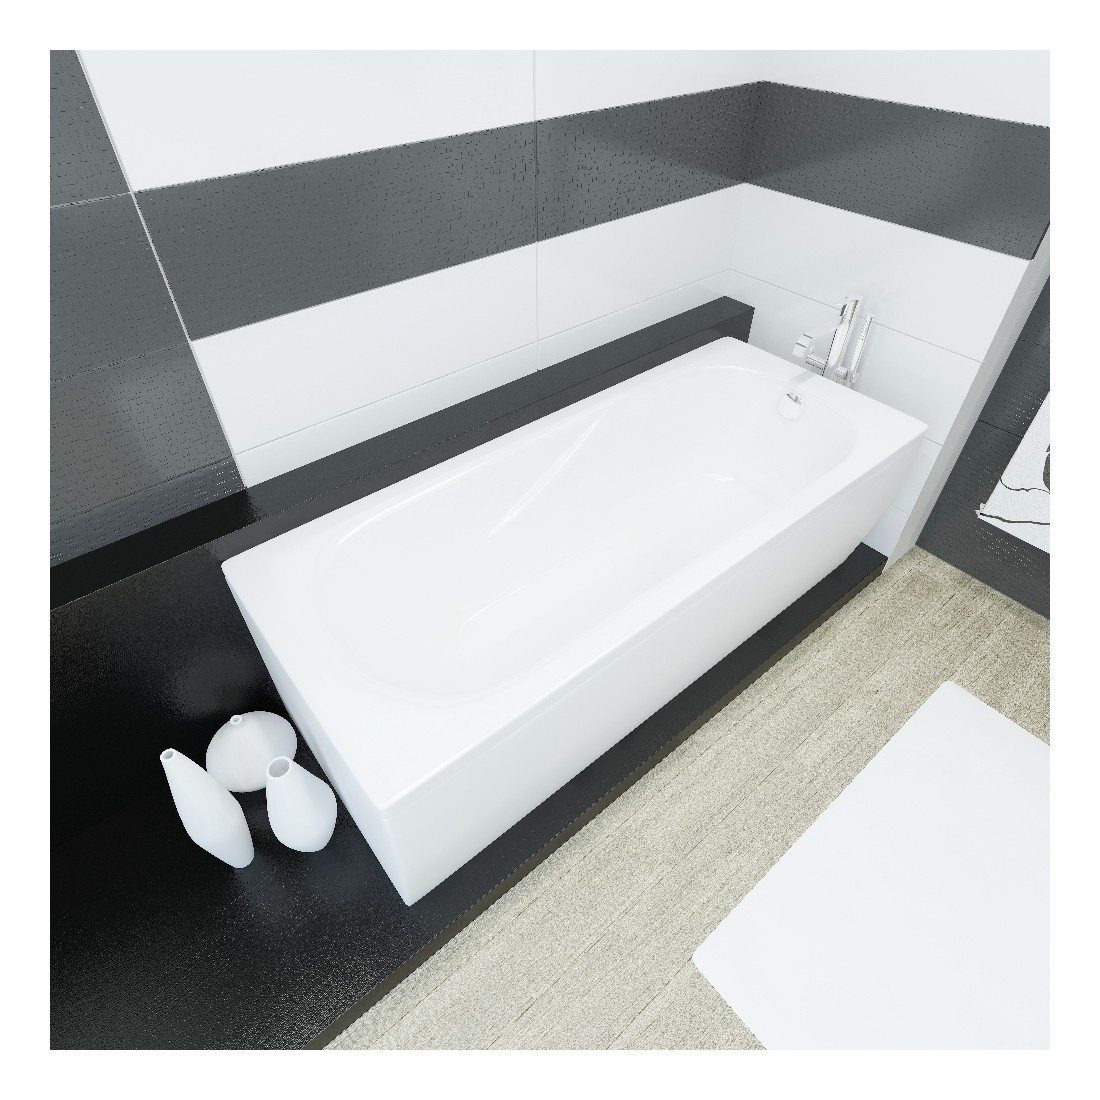 Akmens masės vonia Vispool Classica balta, 180x75